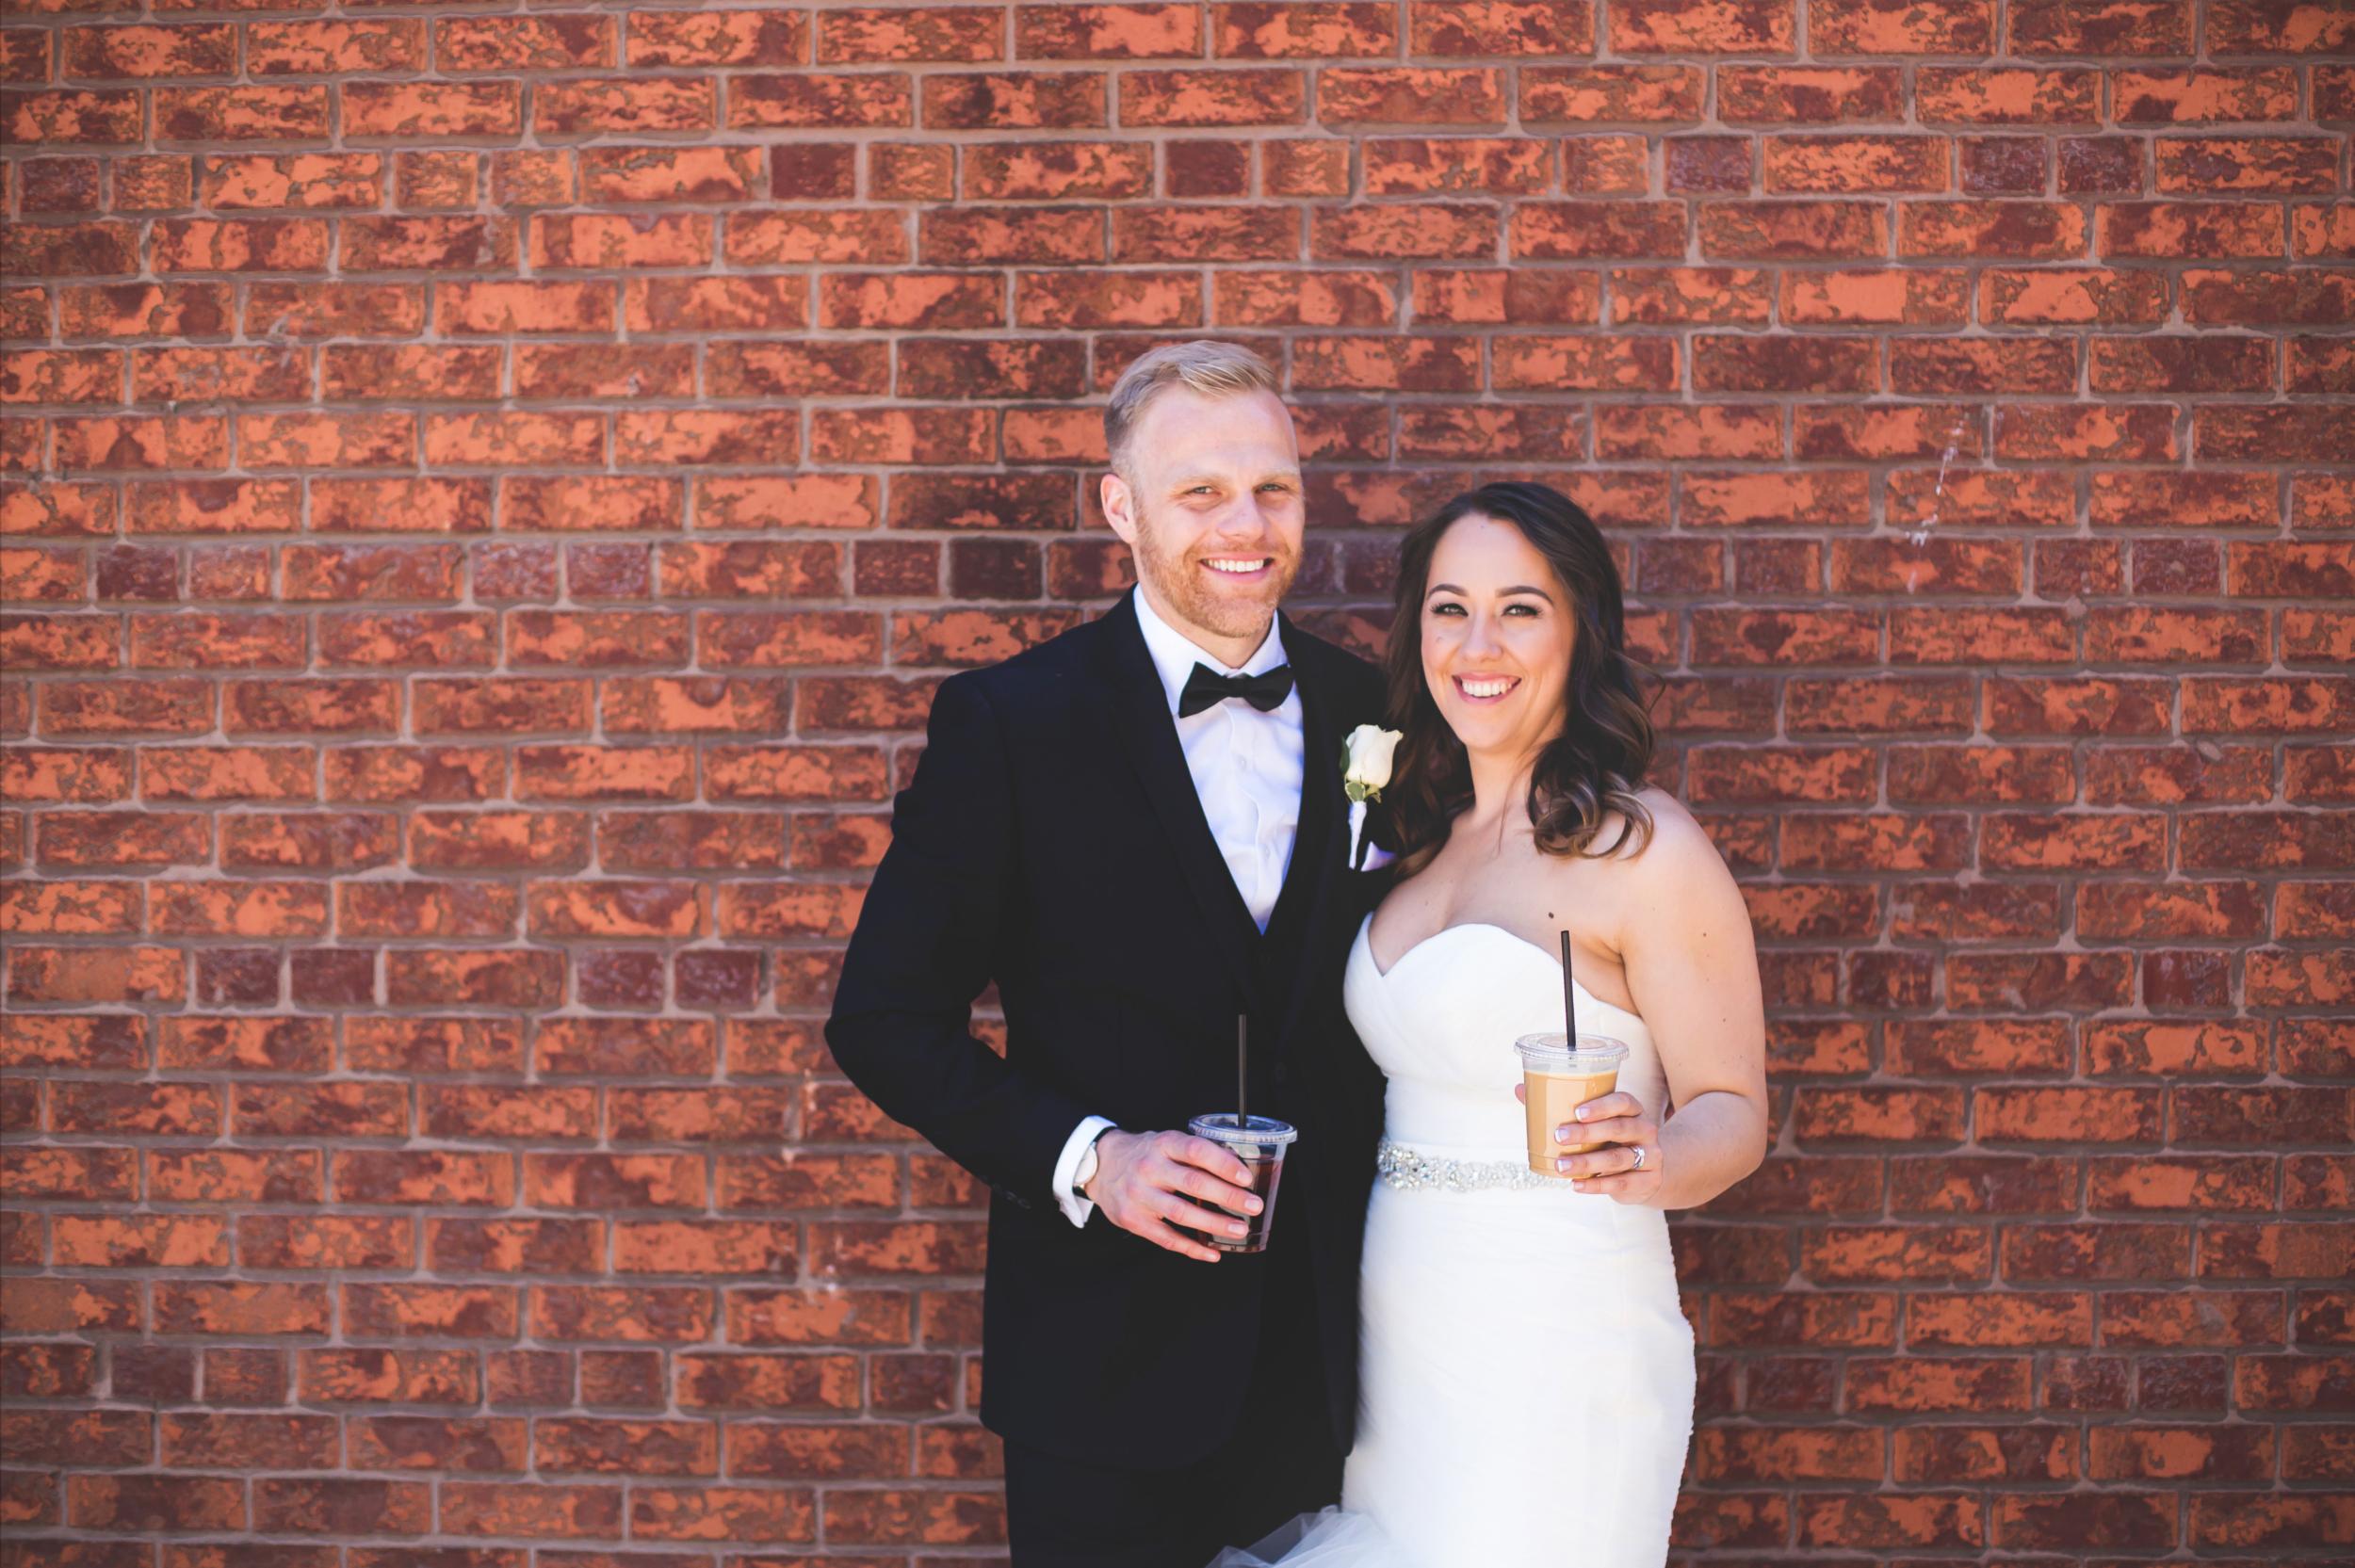 Wedding-Harbour-Banquet-Center-Oakville-Photographer-Wedding-Hamilton-Saint-James-Espresso-Downtown-HamOnt-GTA-Niagara-Toronto-Moments-by-Lauren-Photography-Photo-Image-32.png